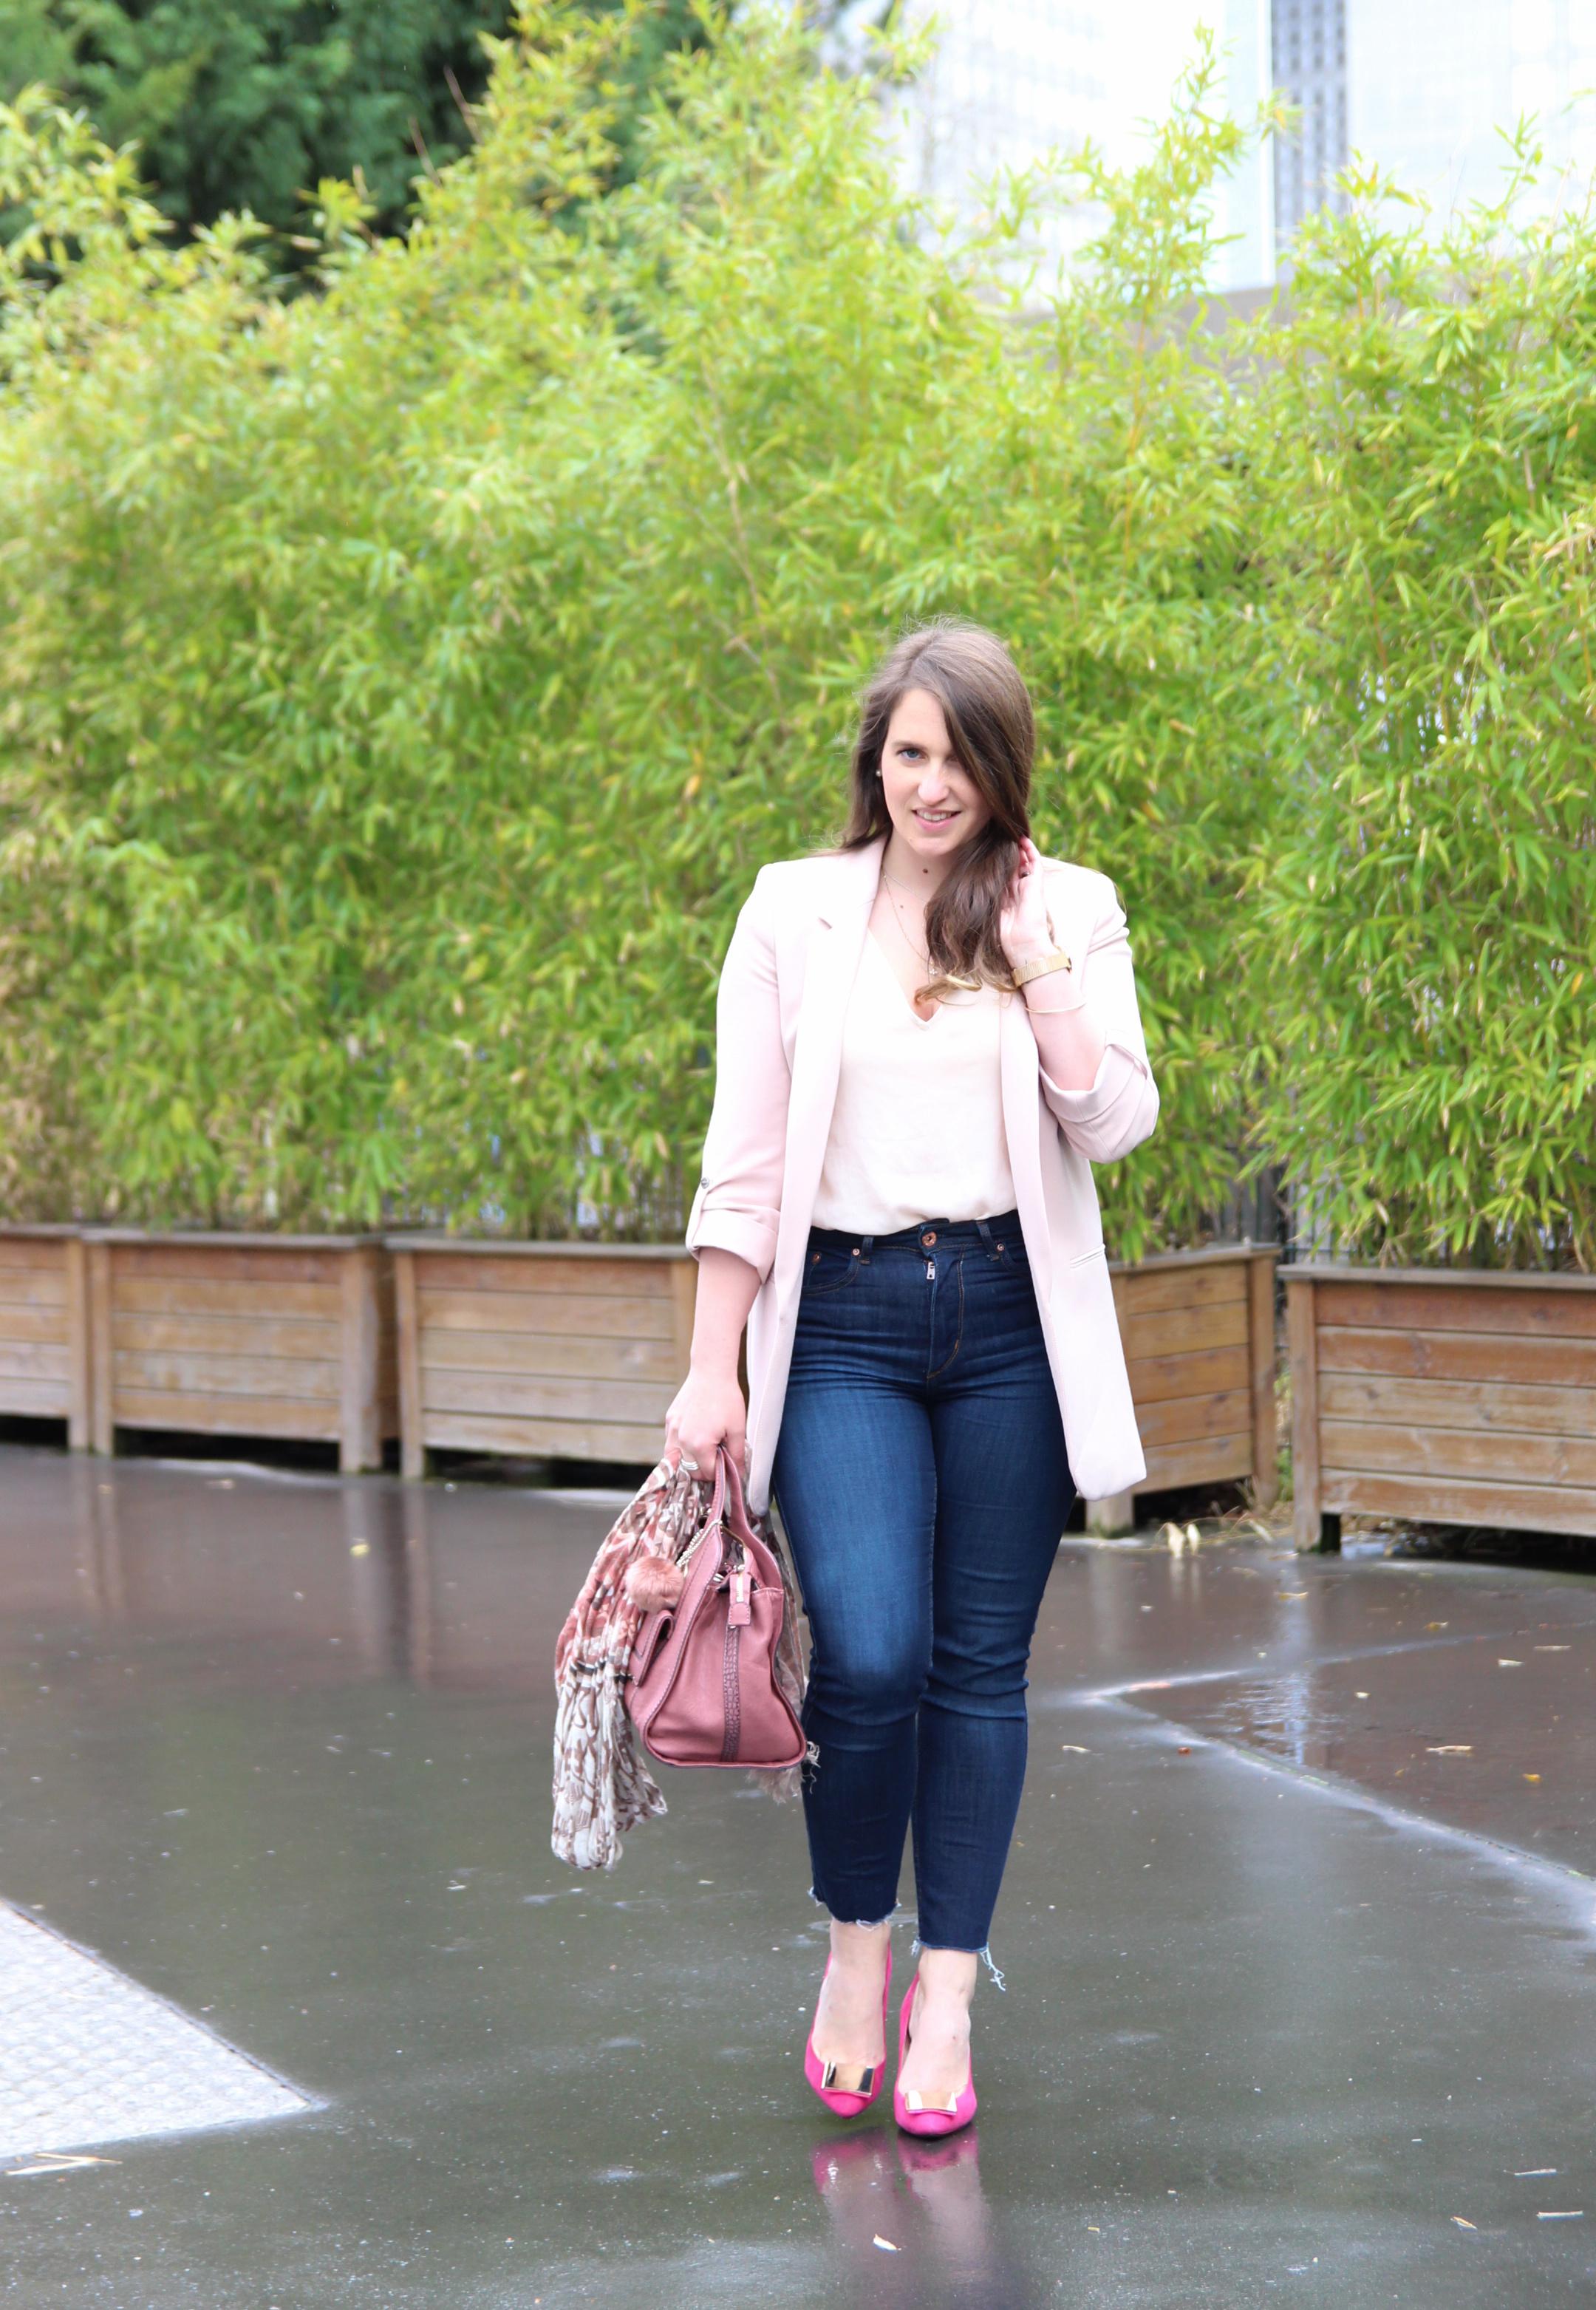 fashionblogger-influencer-jacket-zara-rosepastel-paris-seralynepointcom-2017-03-21 115443